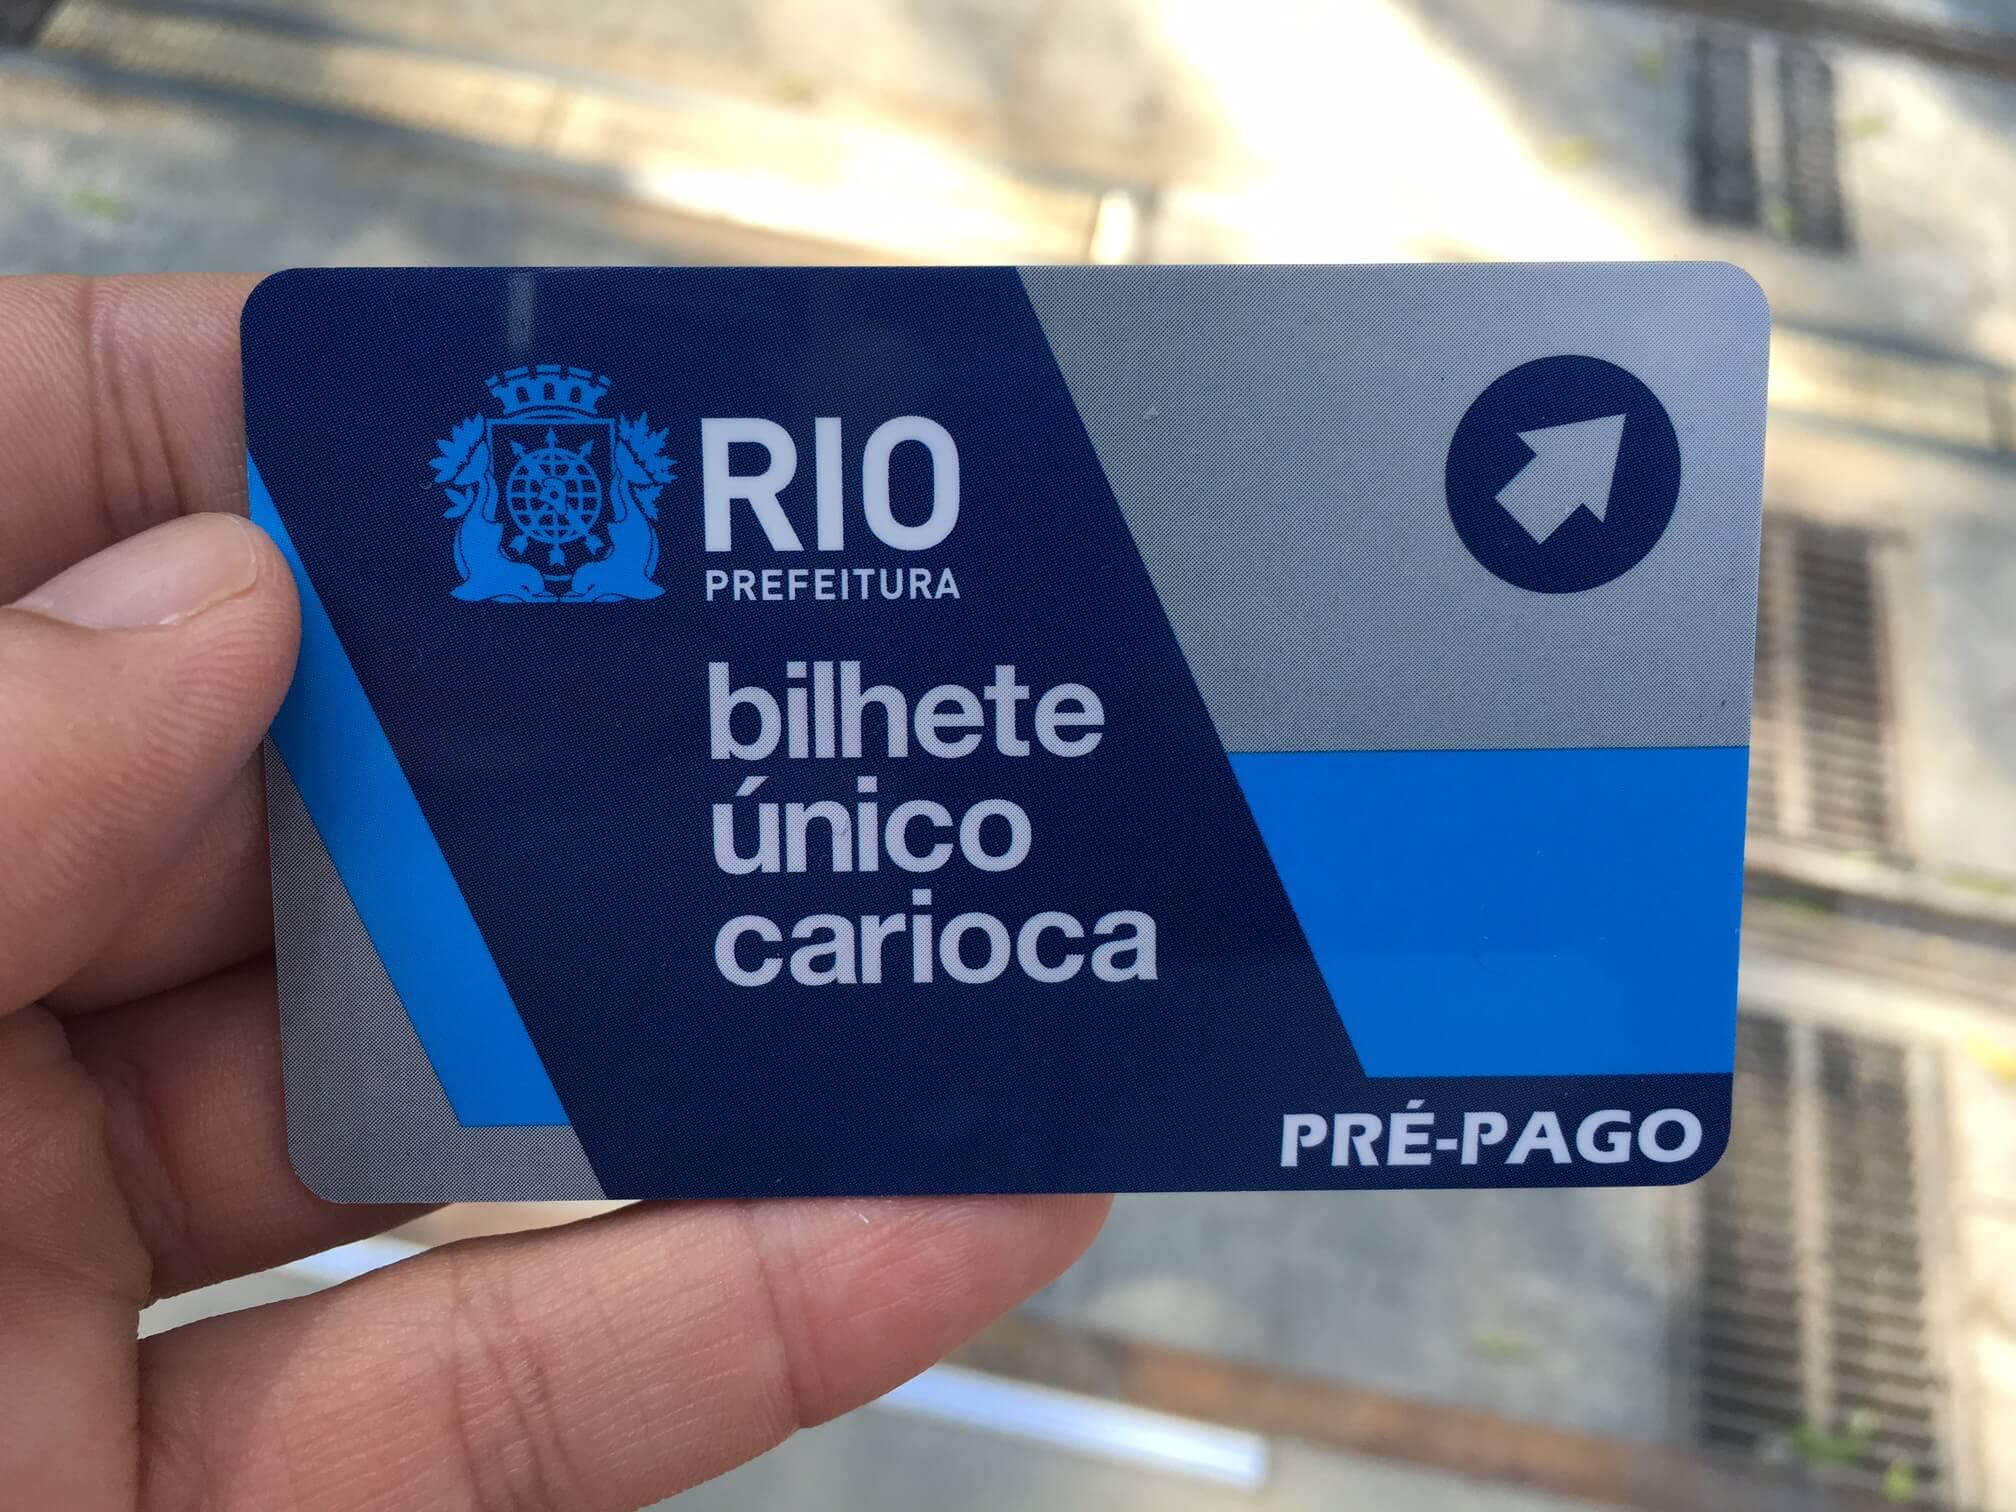 Bilhete Única Carioca